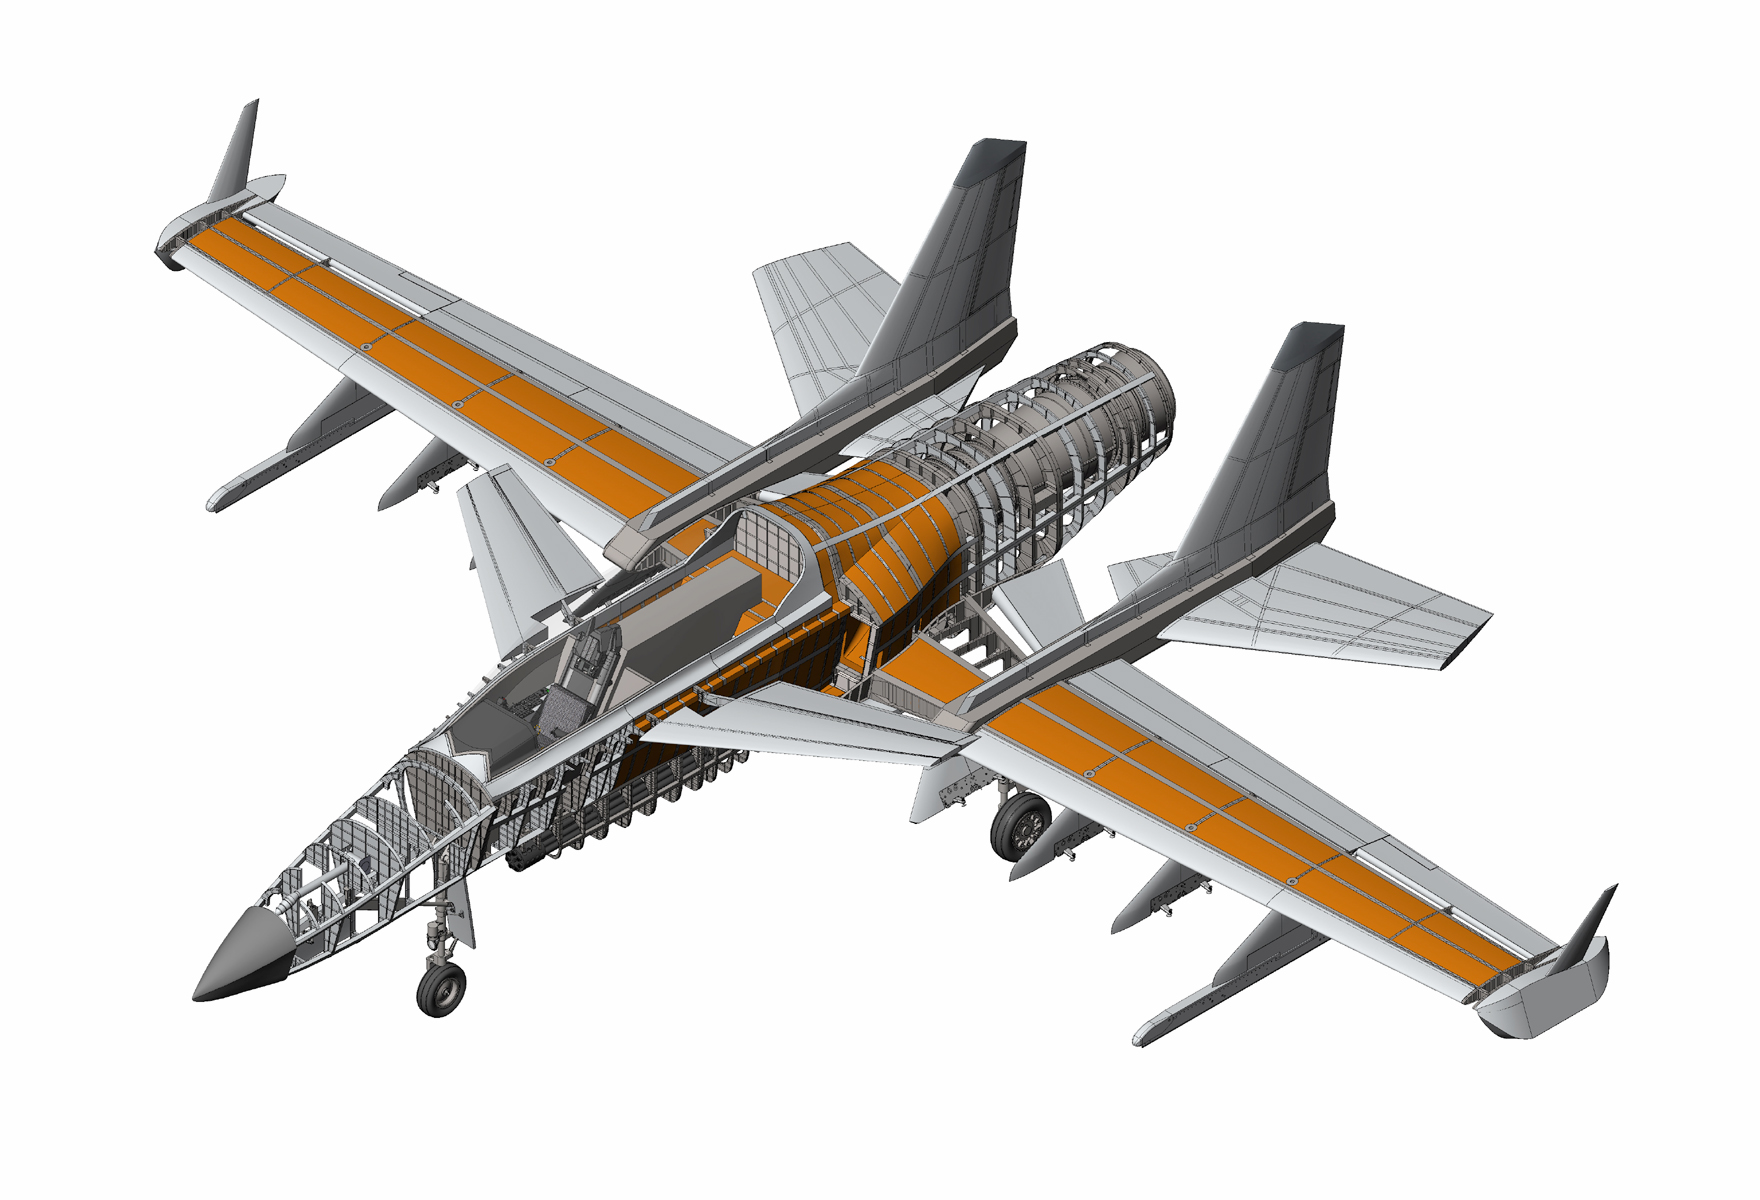 Stavatti, SM-28, Machete, Turbofan, Close Air Support, CAS